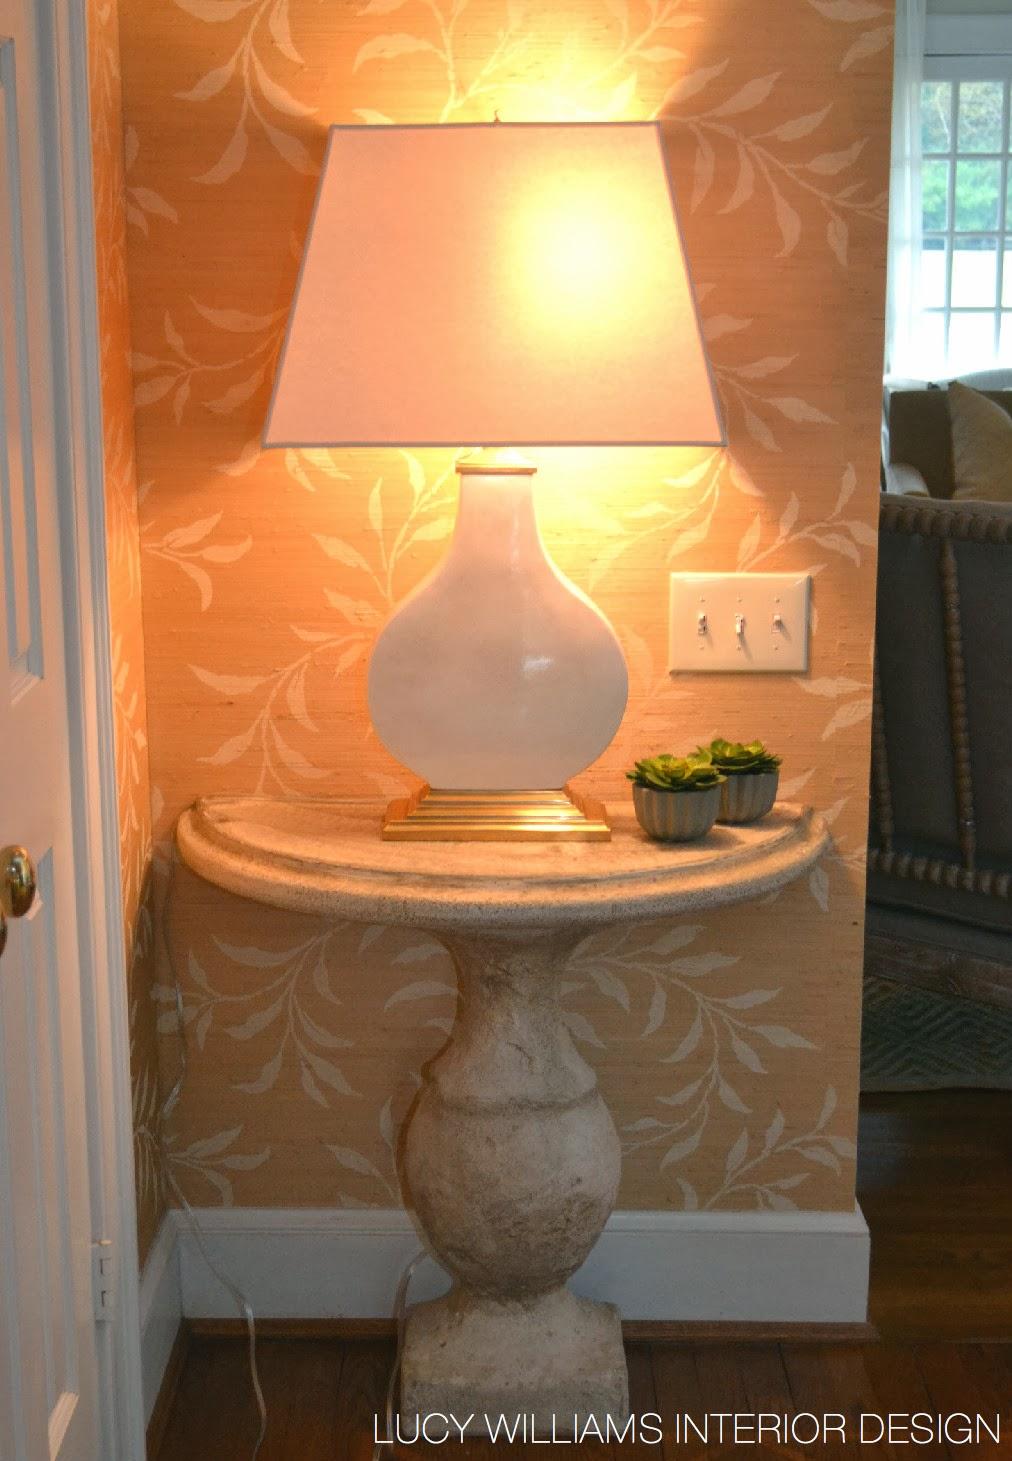 Lucy williams interior design blog pinewood foyer makeover for Lucy williams interiors